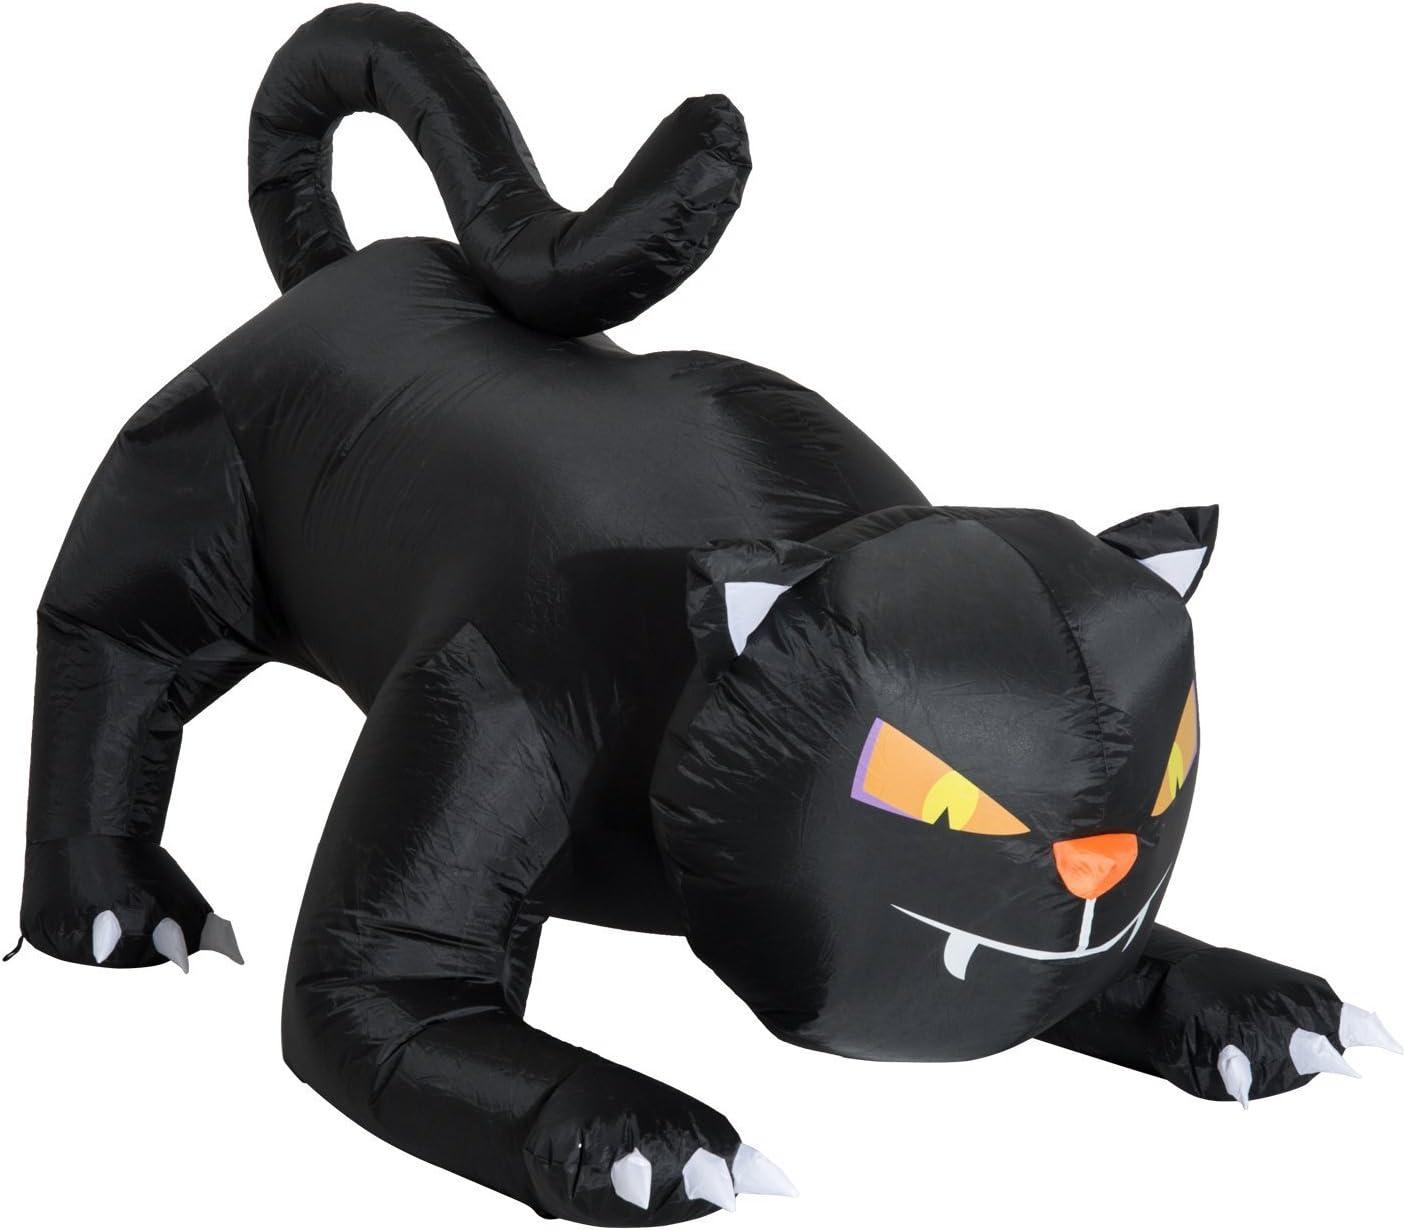 HOMCOM 6 Giant Creeping Black Cat LED Light Outdoor Airblown Inflatable Halloween Yard Decration